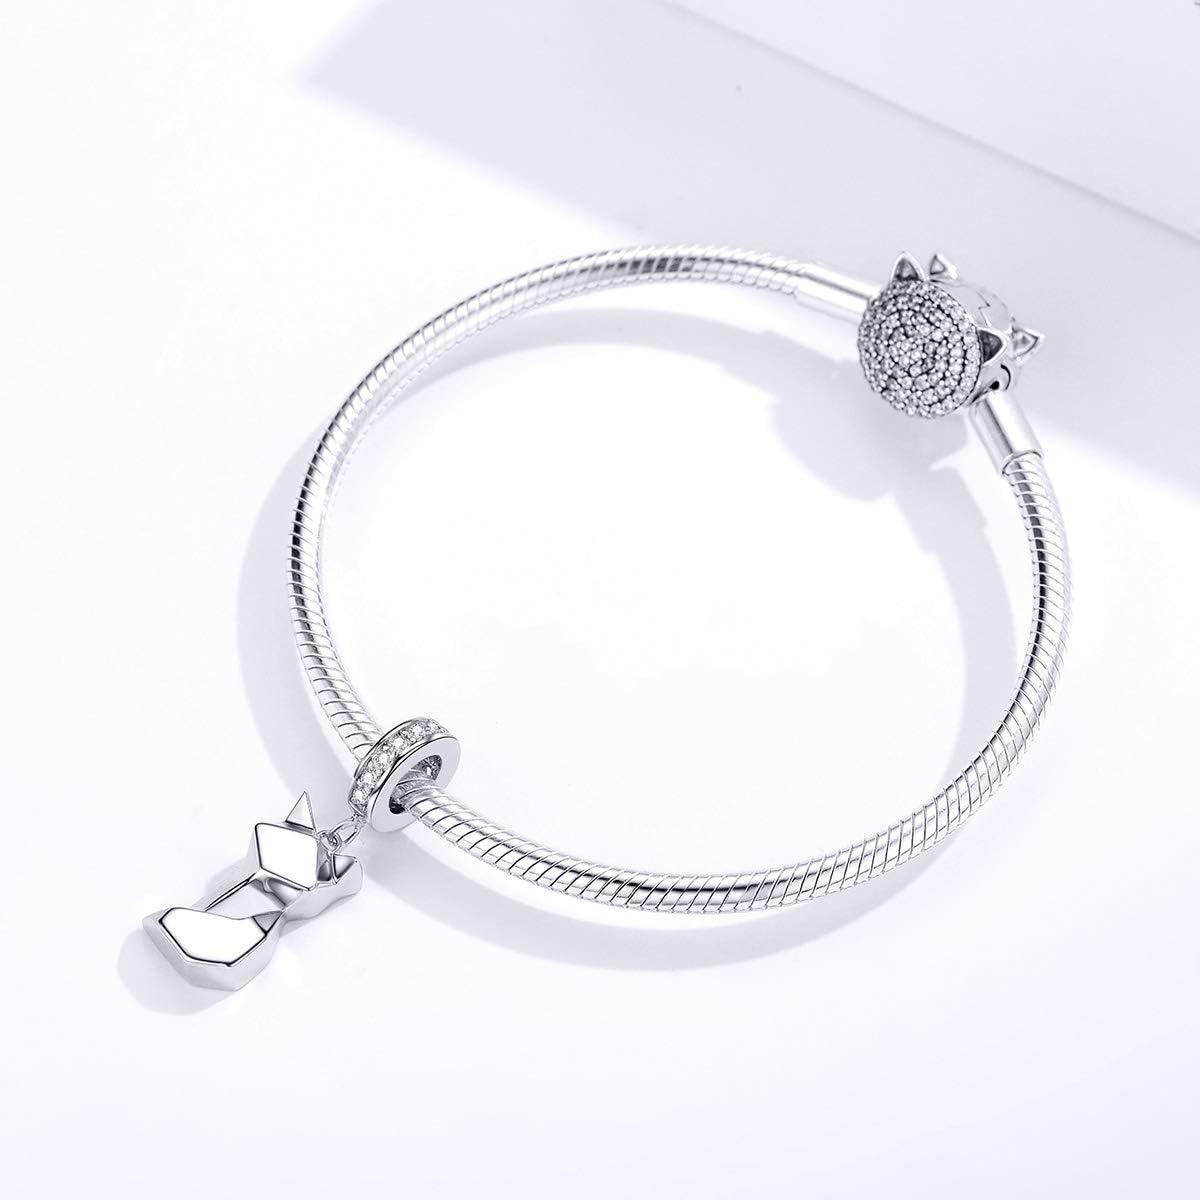 European 925 Silver CZ Charm Beads Pendant Fit sterling Bracelet Necklace N#593